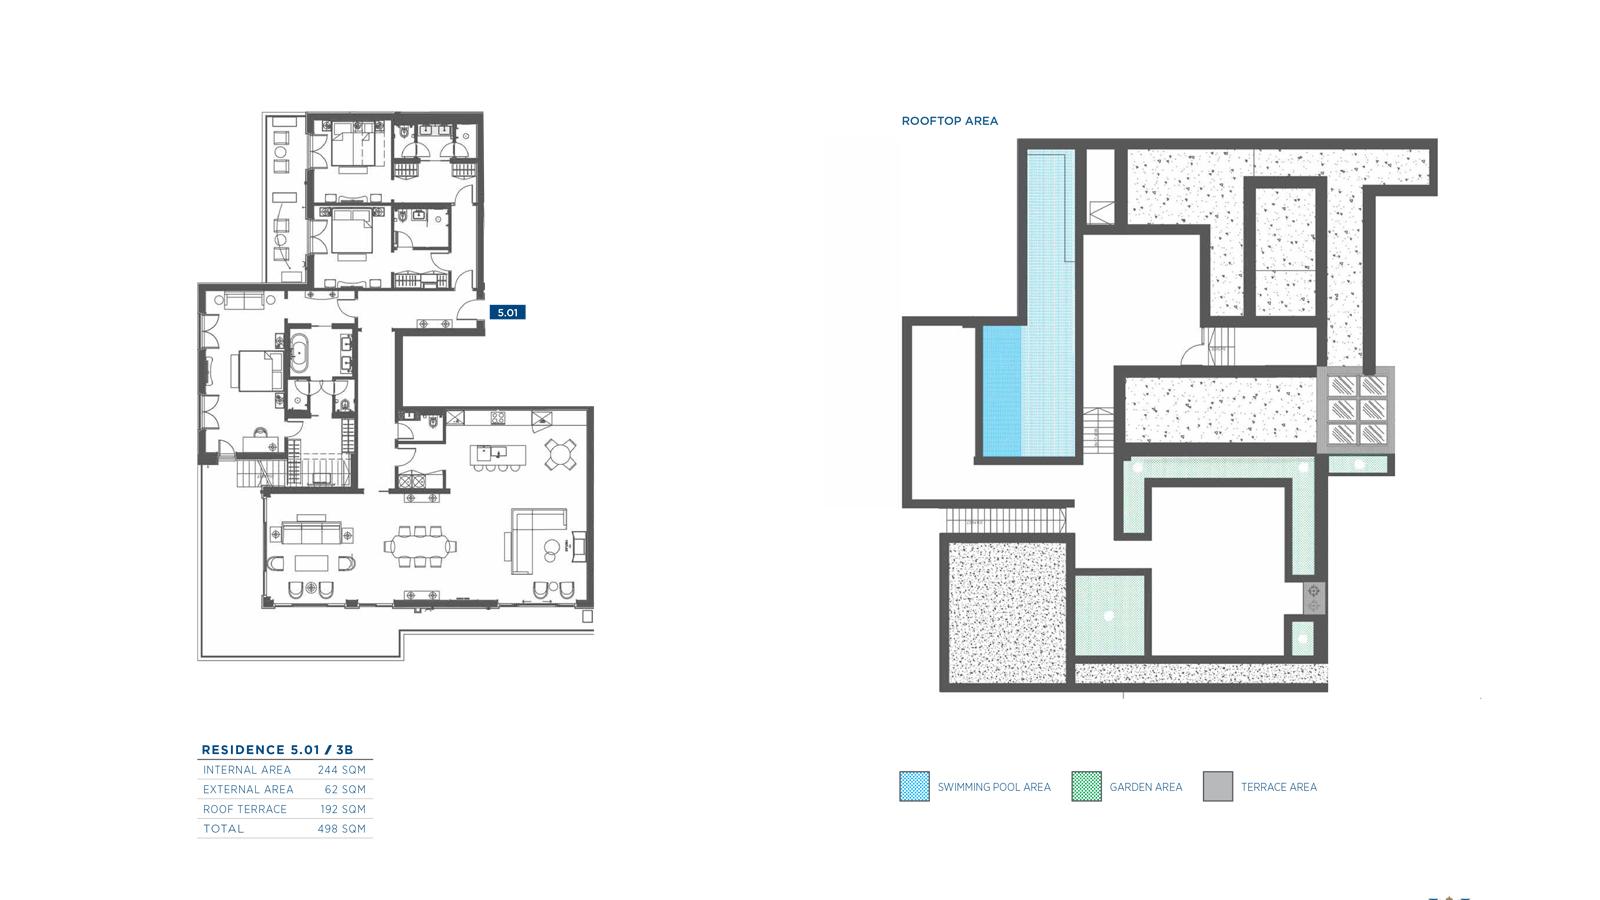 Residence-5-1-3B-498-sqm